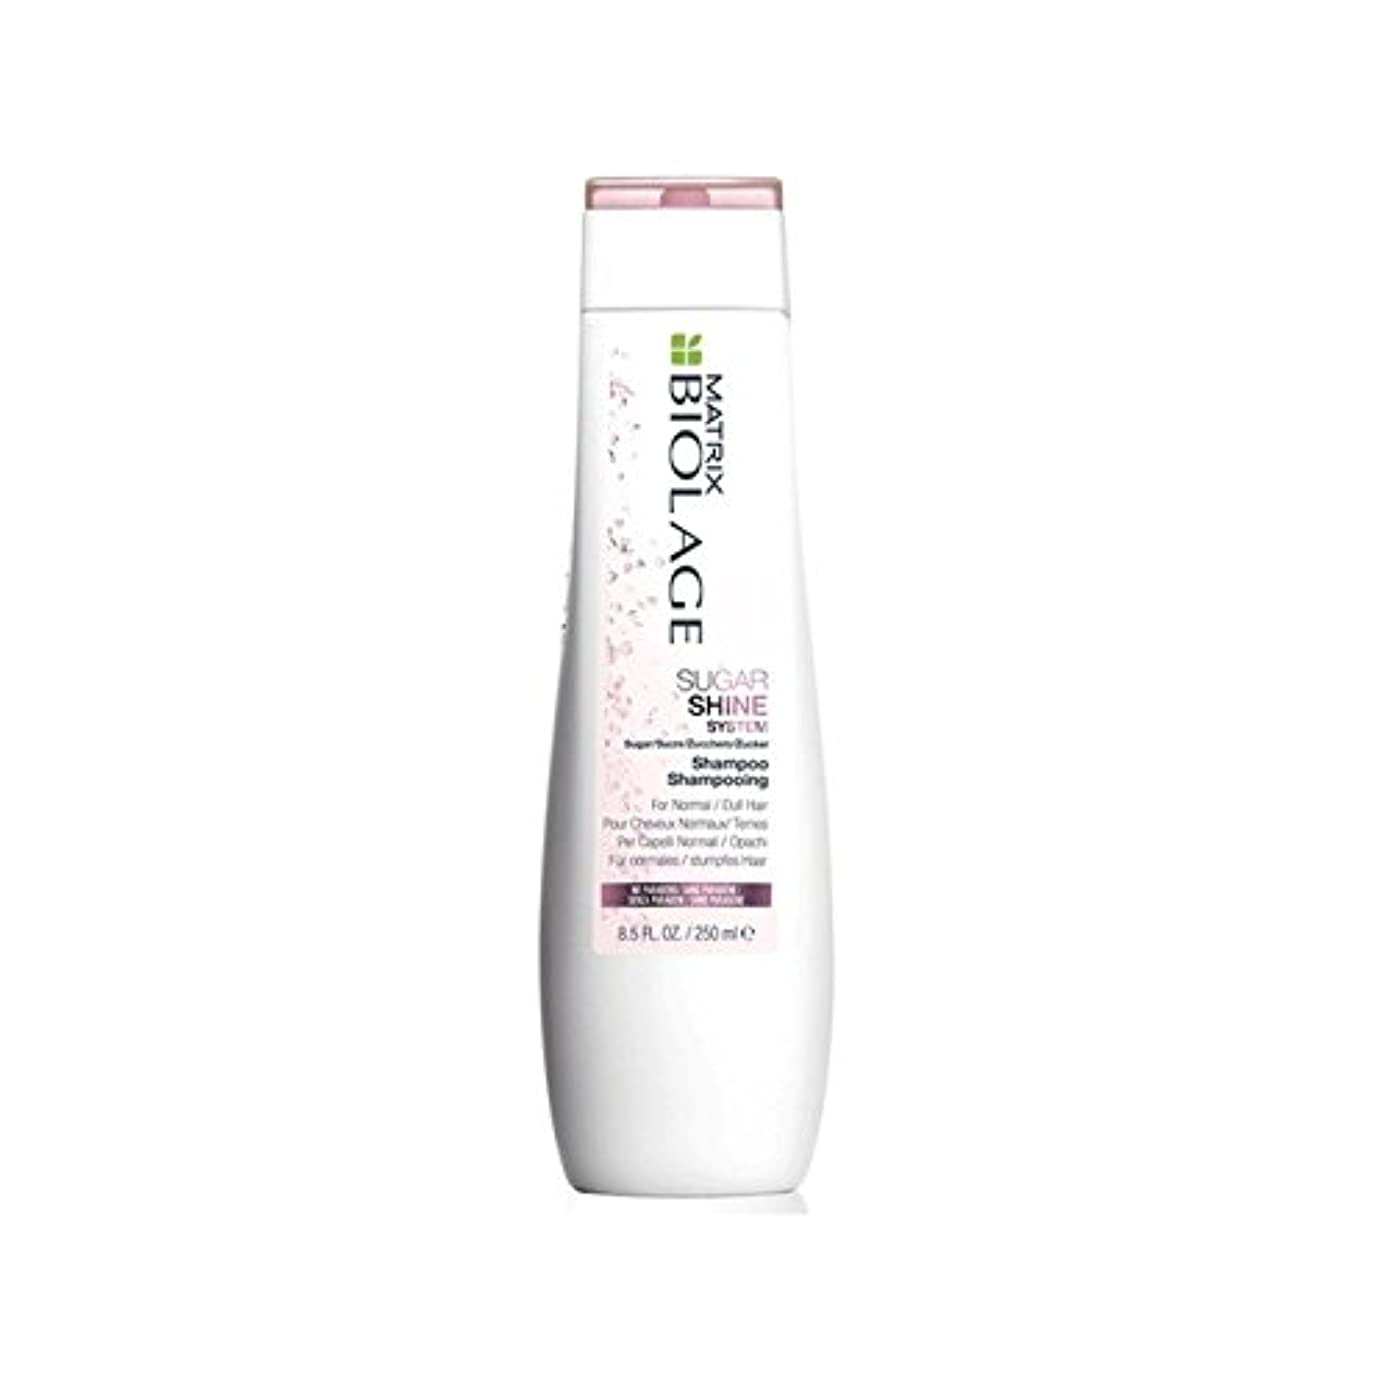 Matrix Biolage Sugarshine Shampoo (250ml) (Pack of 6) - マトリックスバイオレイジのシャンプー(250ミリリットル) x6 [並行輸入品]